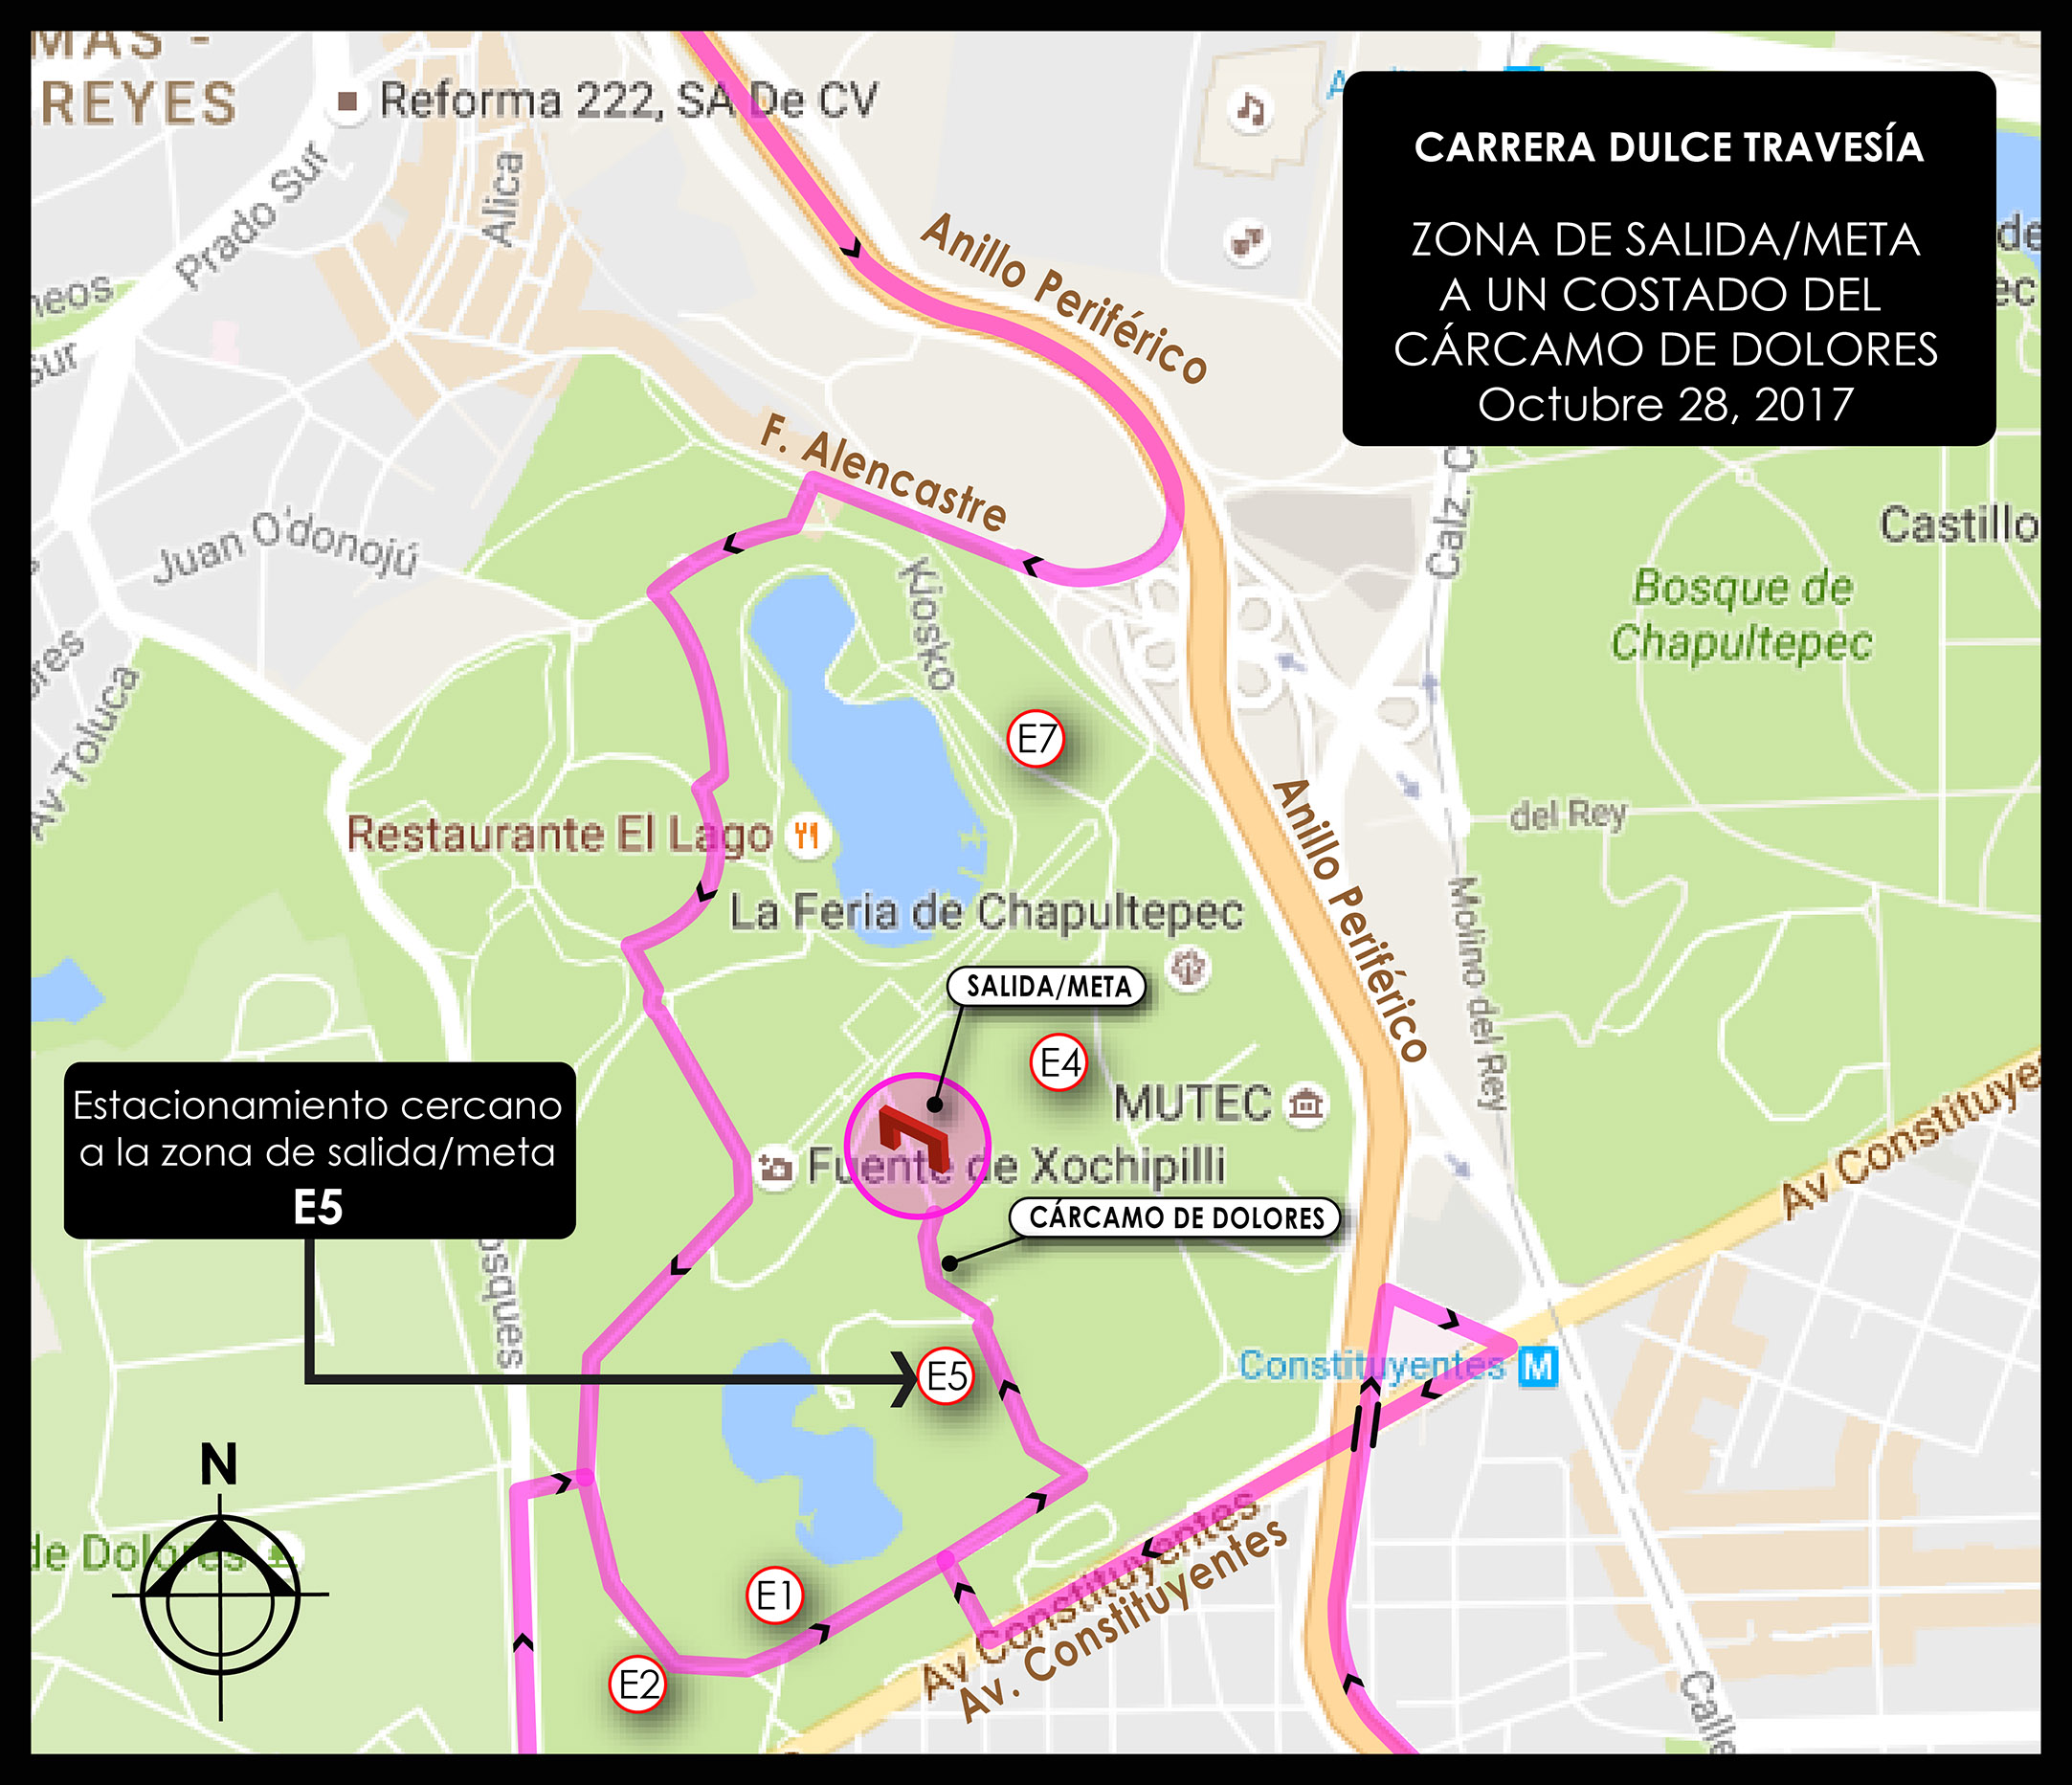 Mapa interior zoologico chapultepec best image konpax 2018 for Ministerio del interior ubicacion mapa